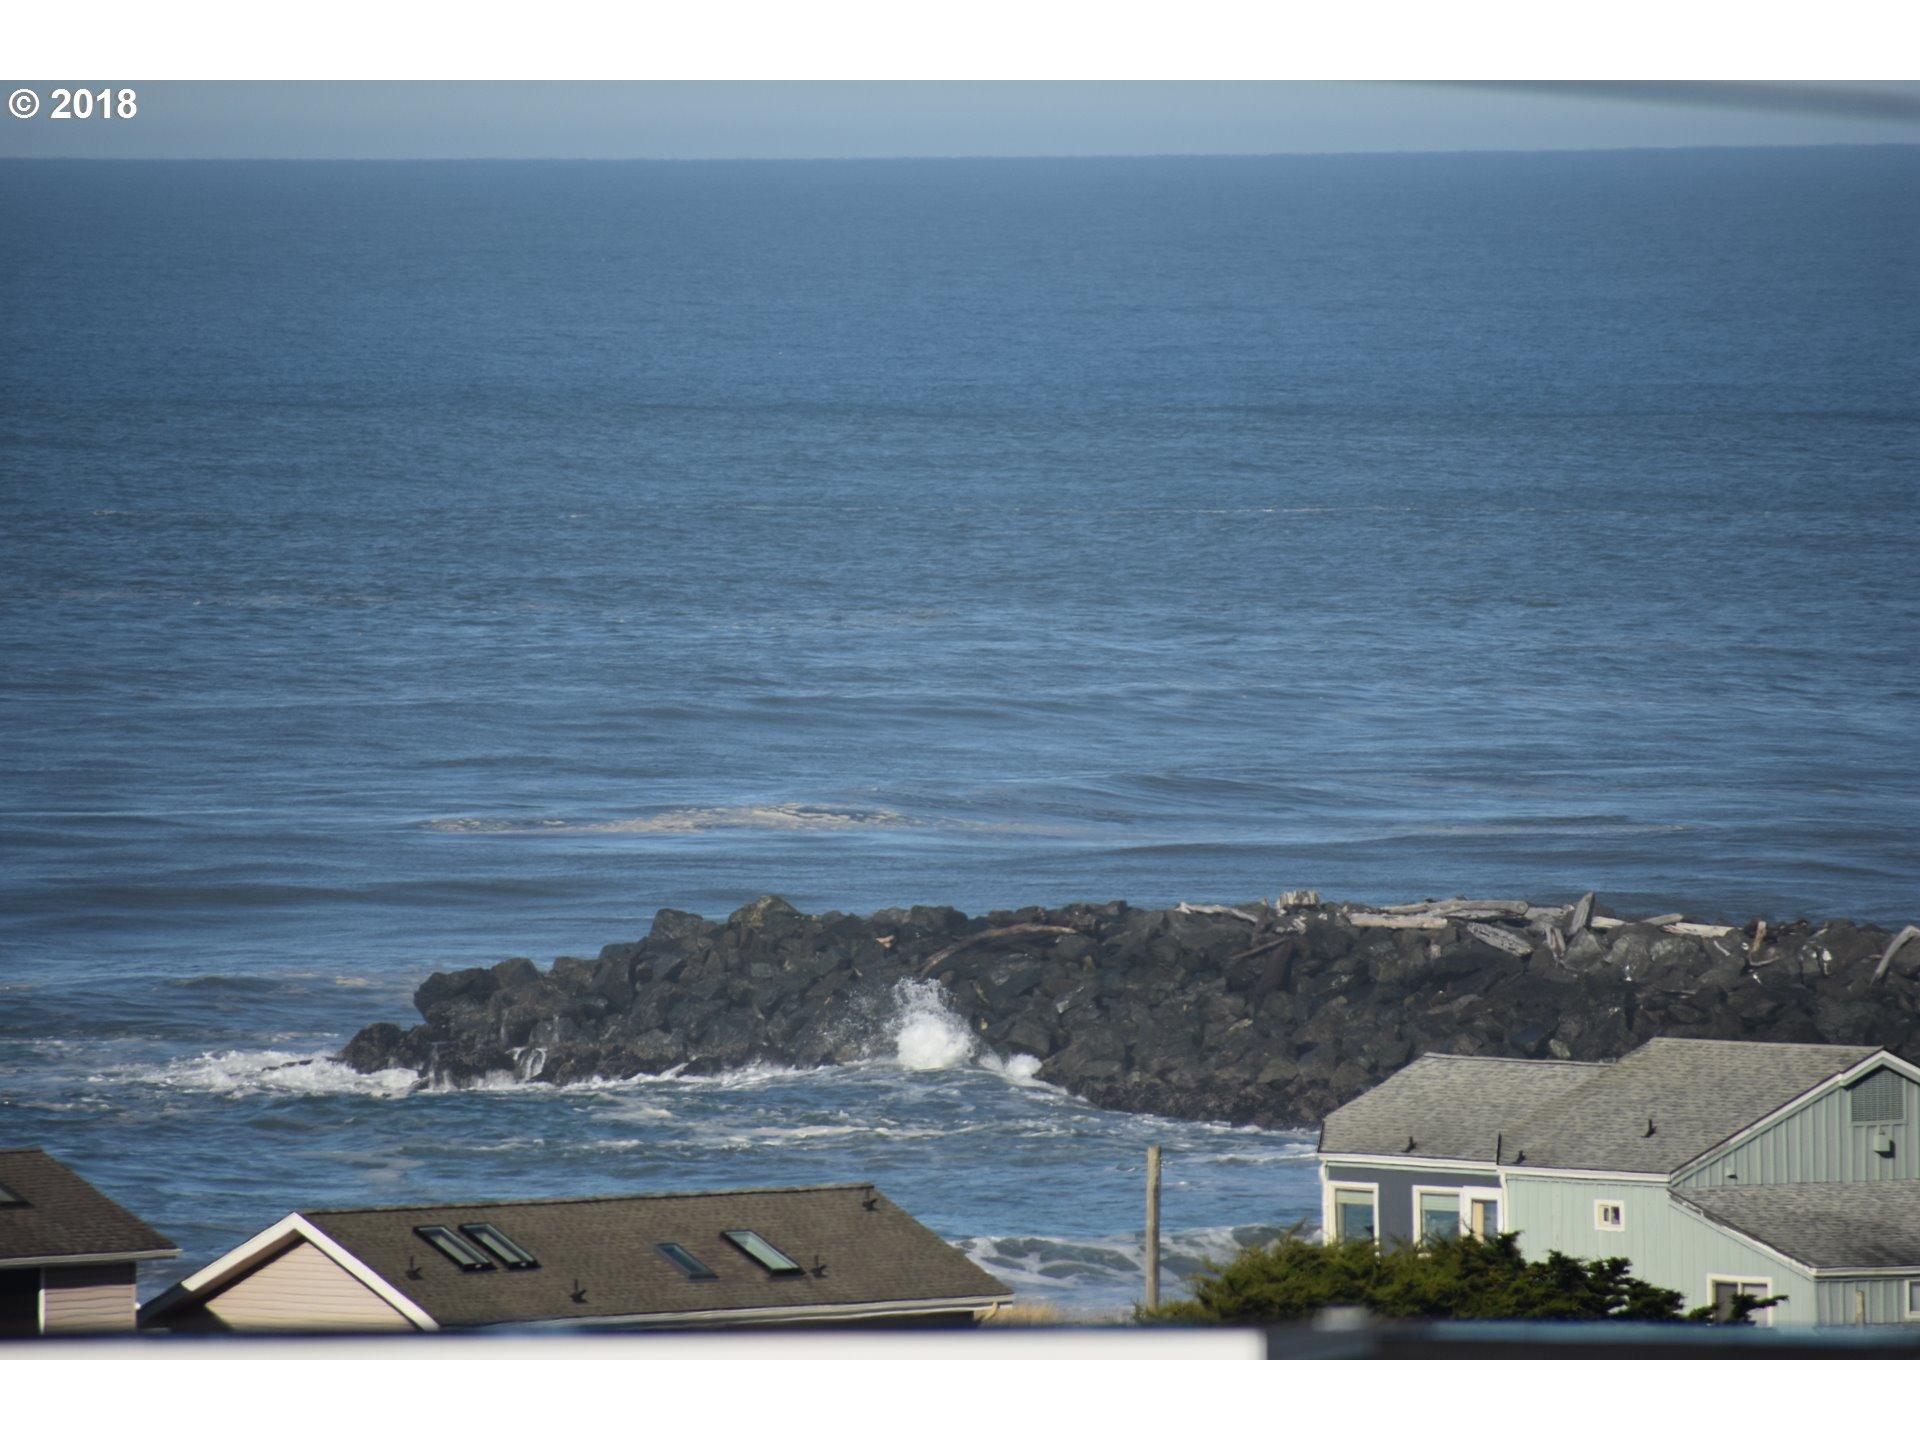 967 OCEAN DR